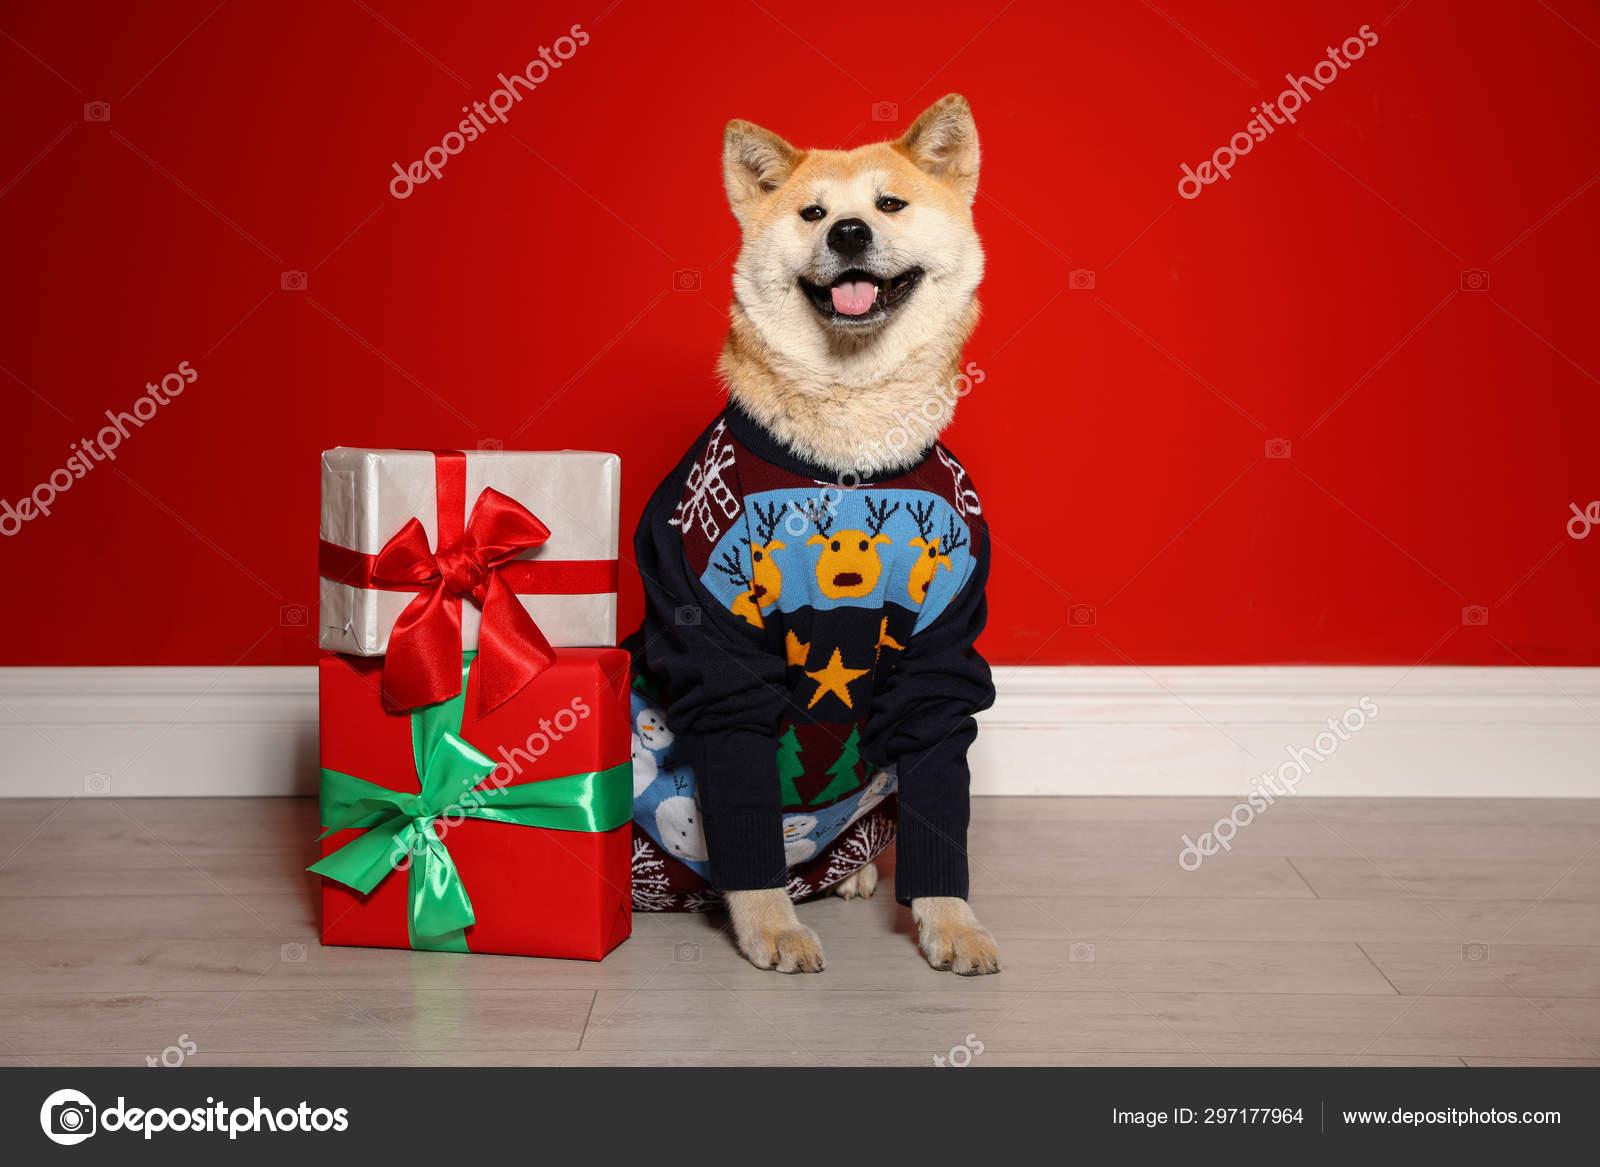 Anjing Akita Inu Yang Lucu Dengan Sweater Natal Di Dekat Kotak Hadiah Di Dalam Ruangan Stok Foto C Liudmilachernetska Gmail Com 297177964